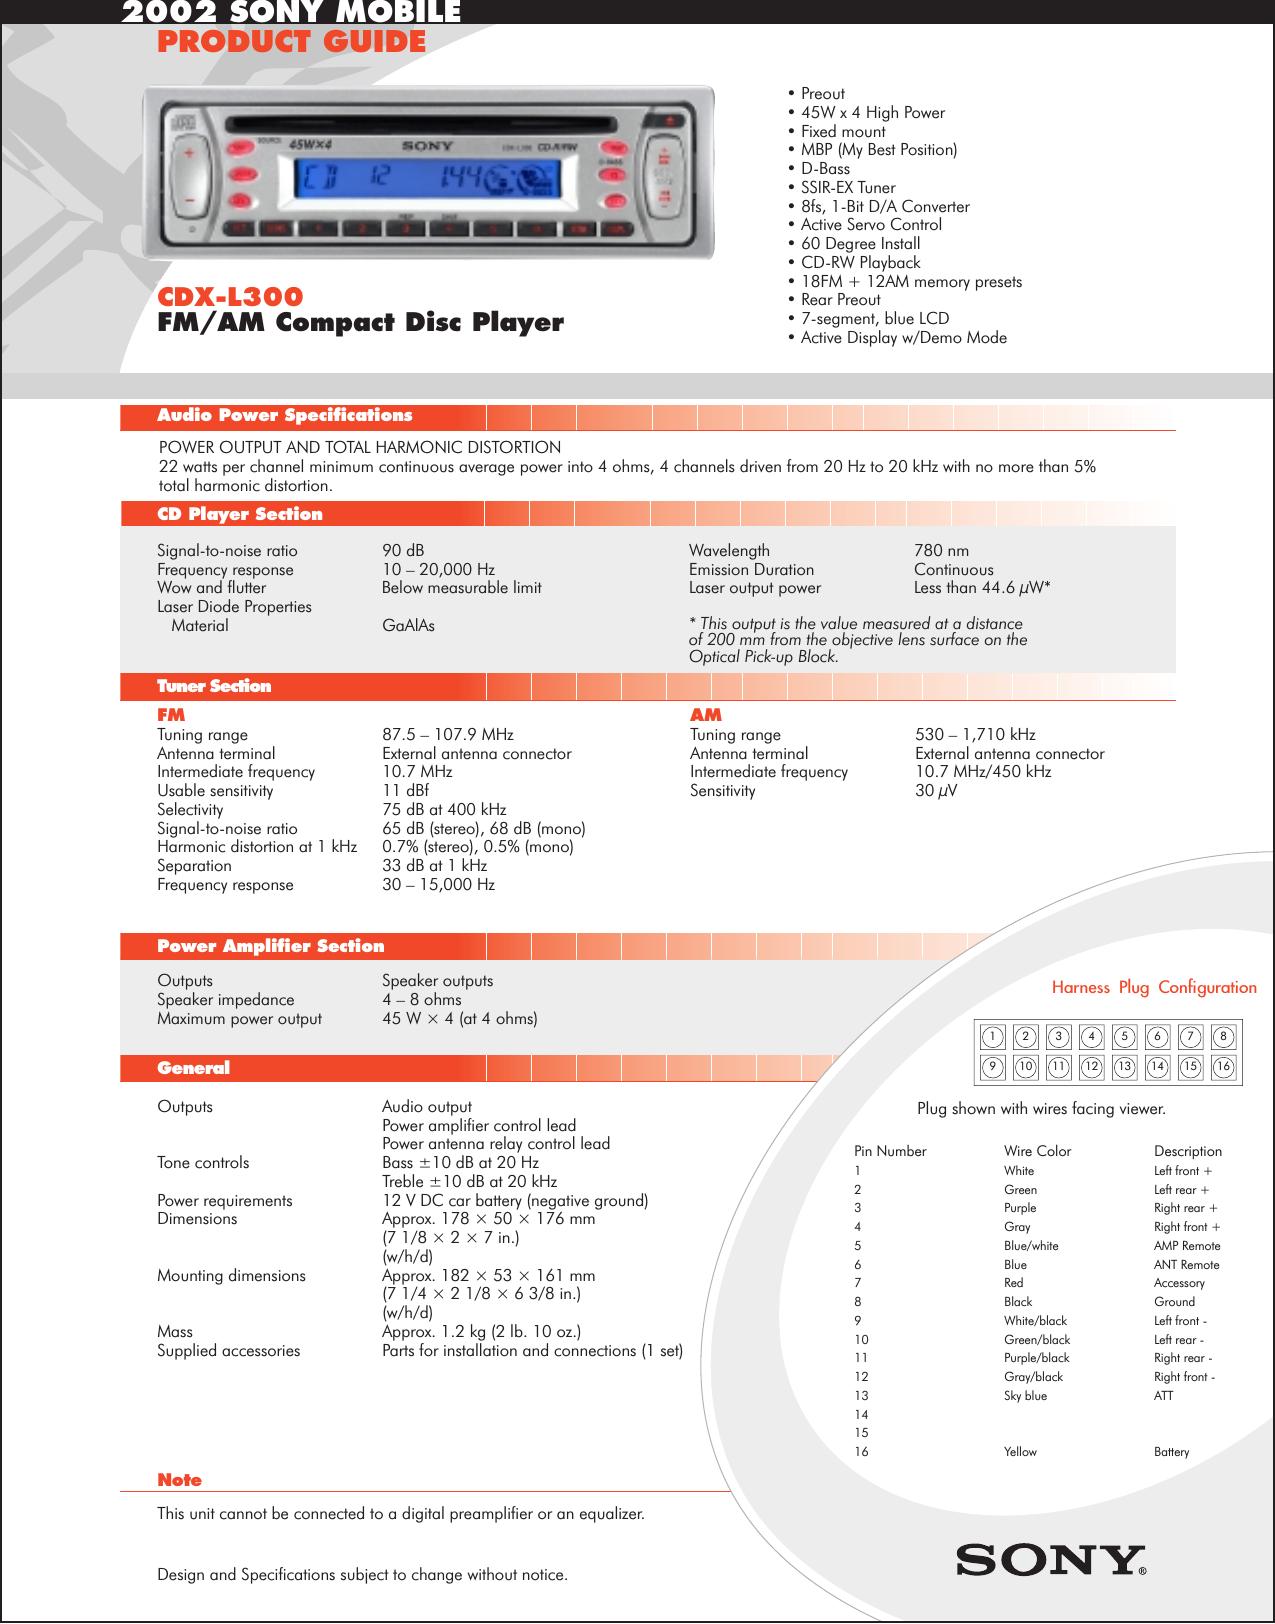 Stupendous Sony Cdx L300 Wiring Diagram Wiring Diagram Database Wiring 101 Mecadwellnesstrialsorg